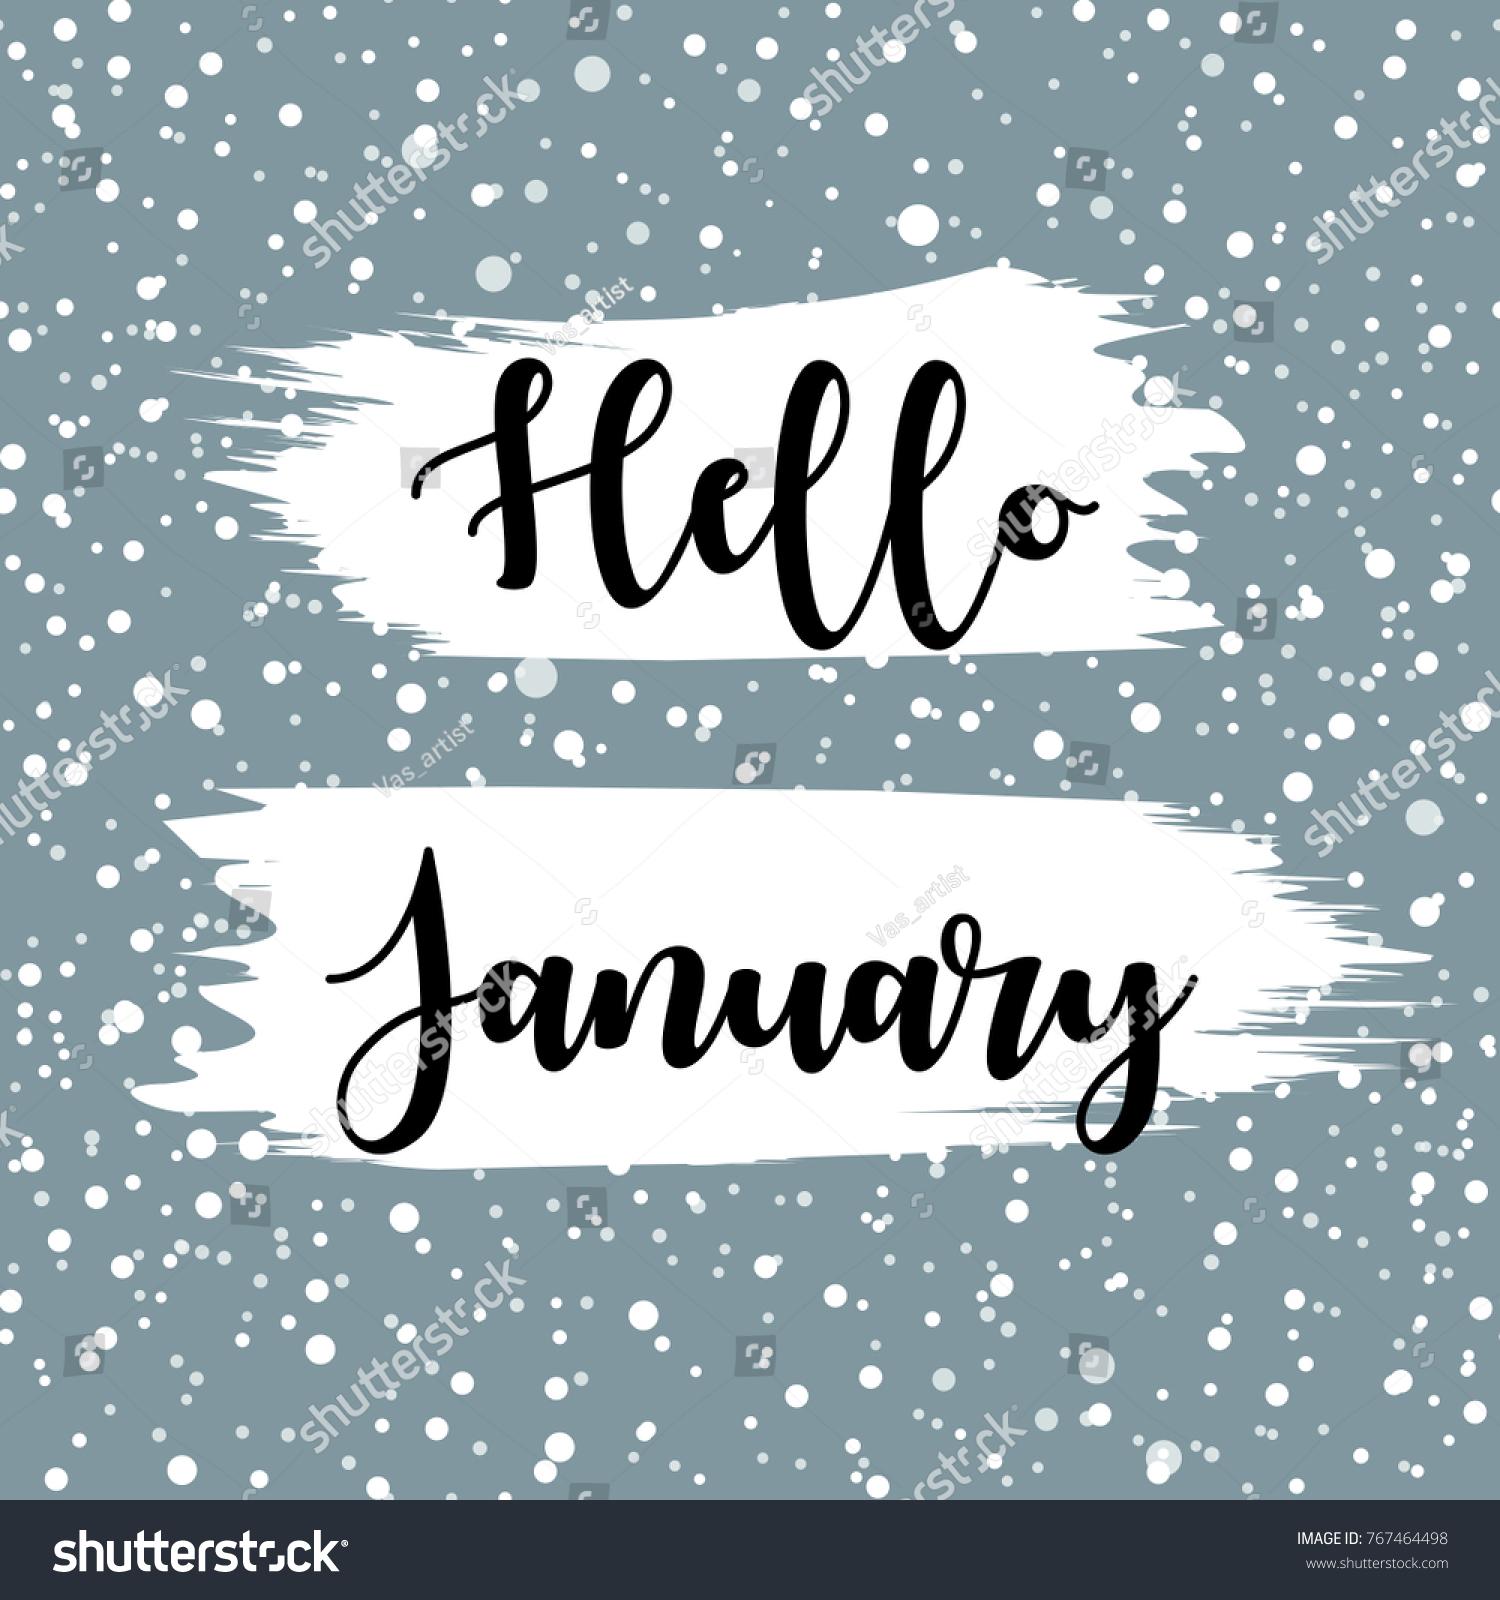 Hello January Winter Vector Illustration Hand Stock Vector 767464498 - Shutterstock